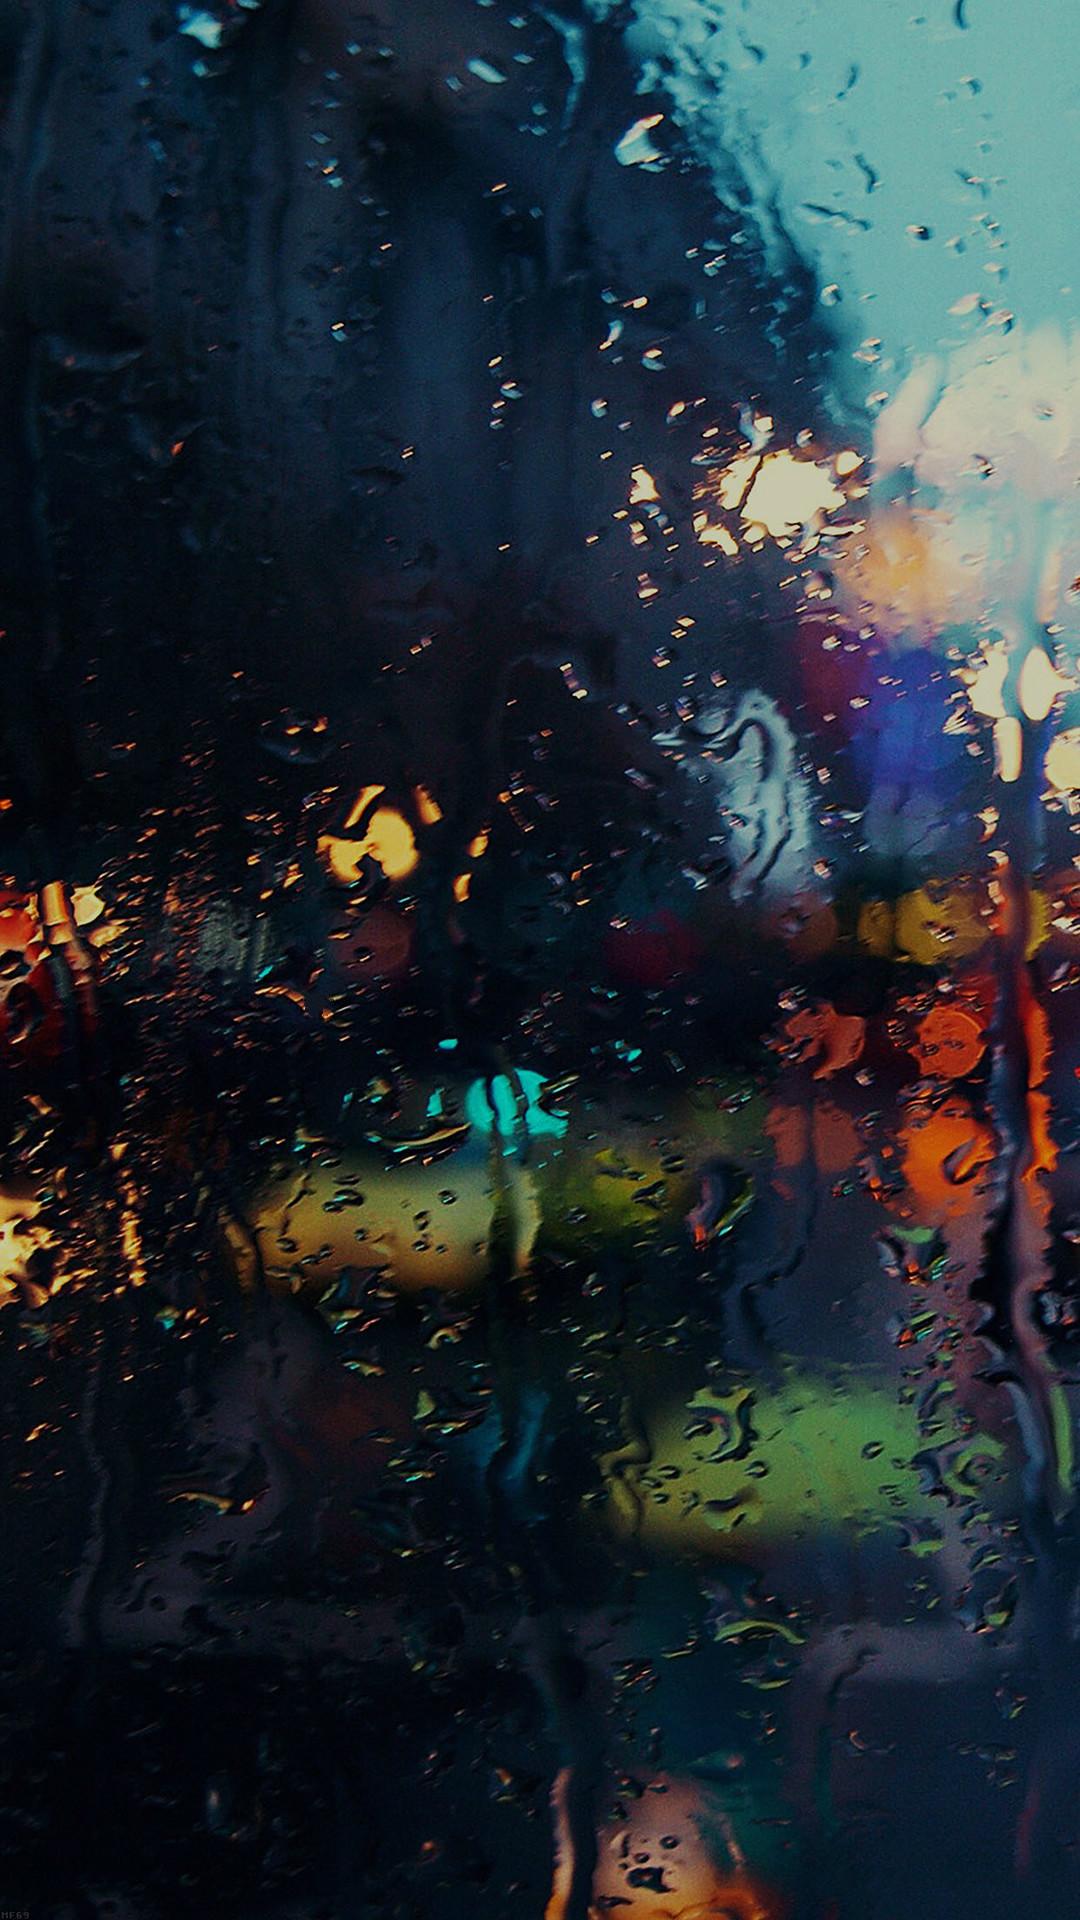 Raining Back Car Window Gloomy Dark Street. Wallpapers IpadPhone  BackgroundsIphone 7RainLost